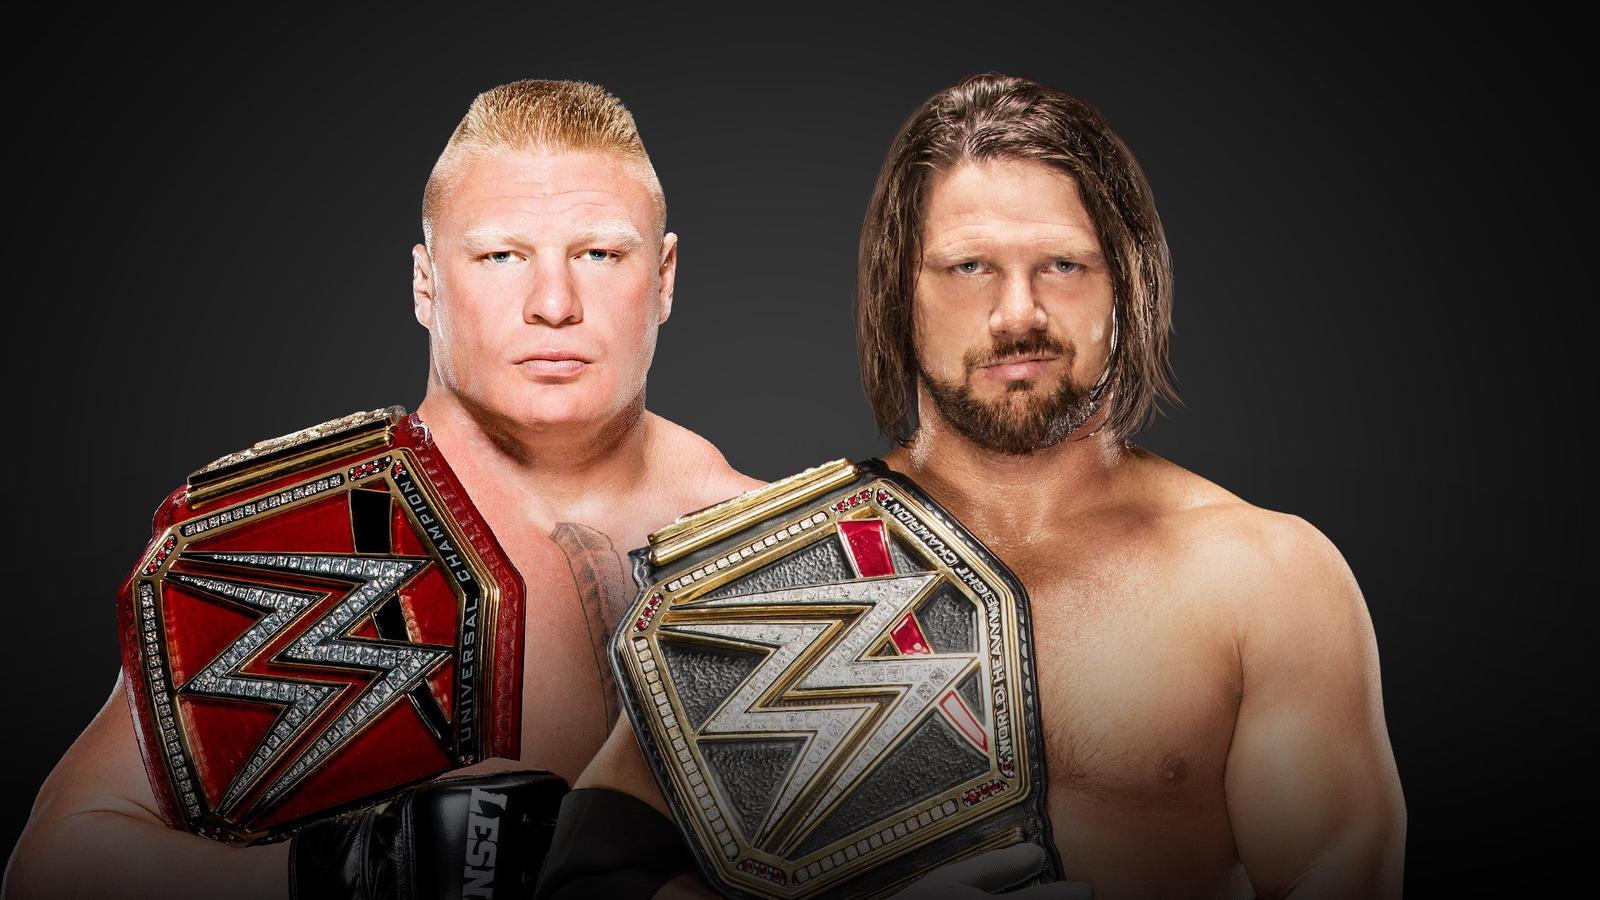 Confirmed & Potential Matches for WWE Survivor Series 2017 20171106_SurvivorSeries_brockaj_update--277aae7a87f35a775041471c0b3e5cc9